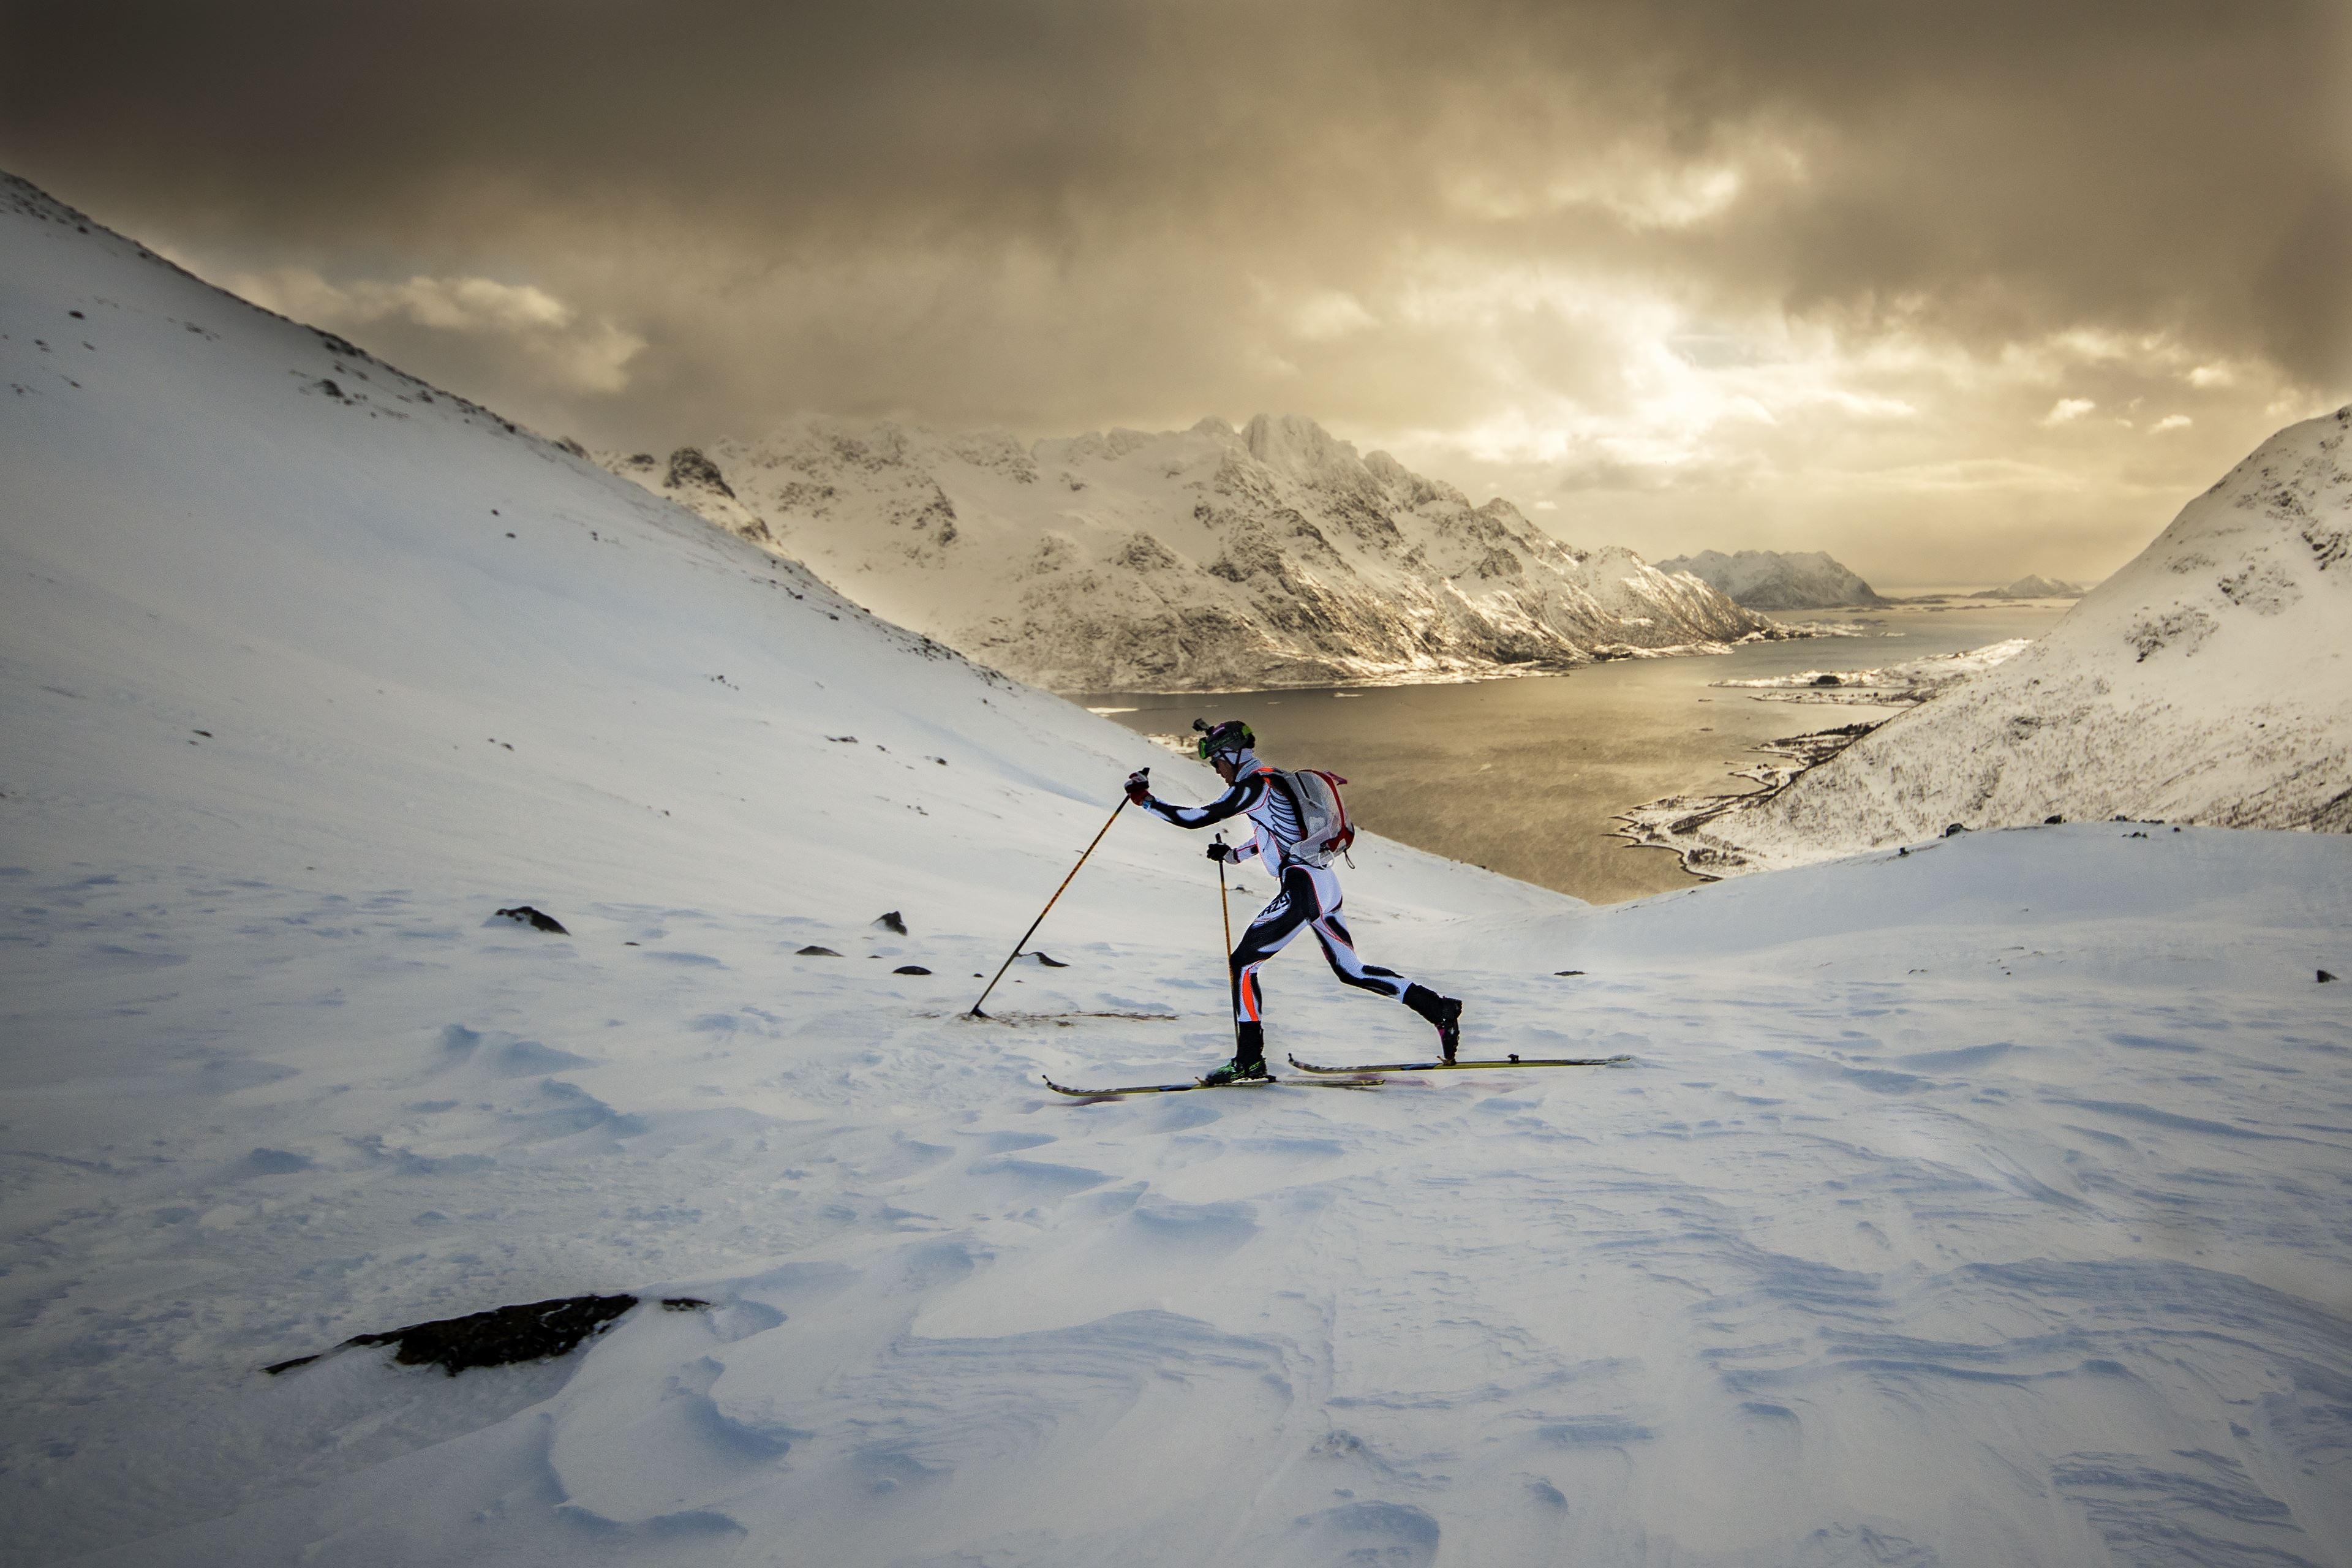 © Kai-Otto Melau / www.thearctictriple.com, Lofoten Skimo 4000+ // The Arctic Triple